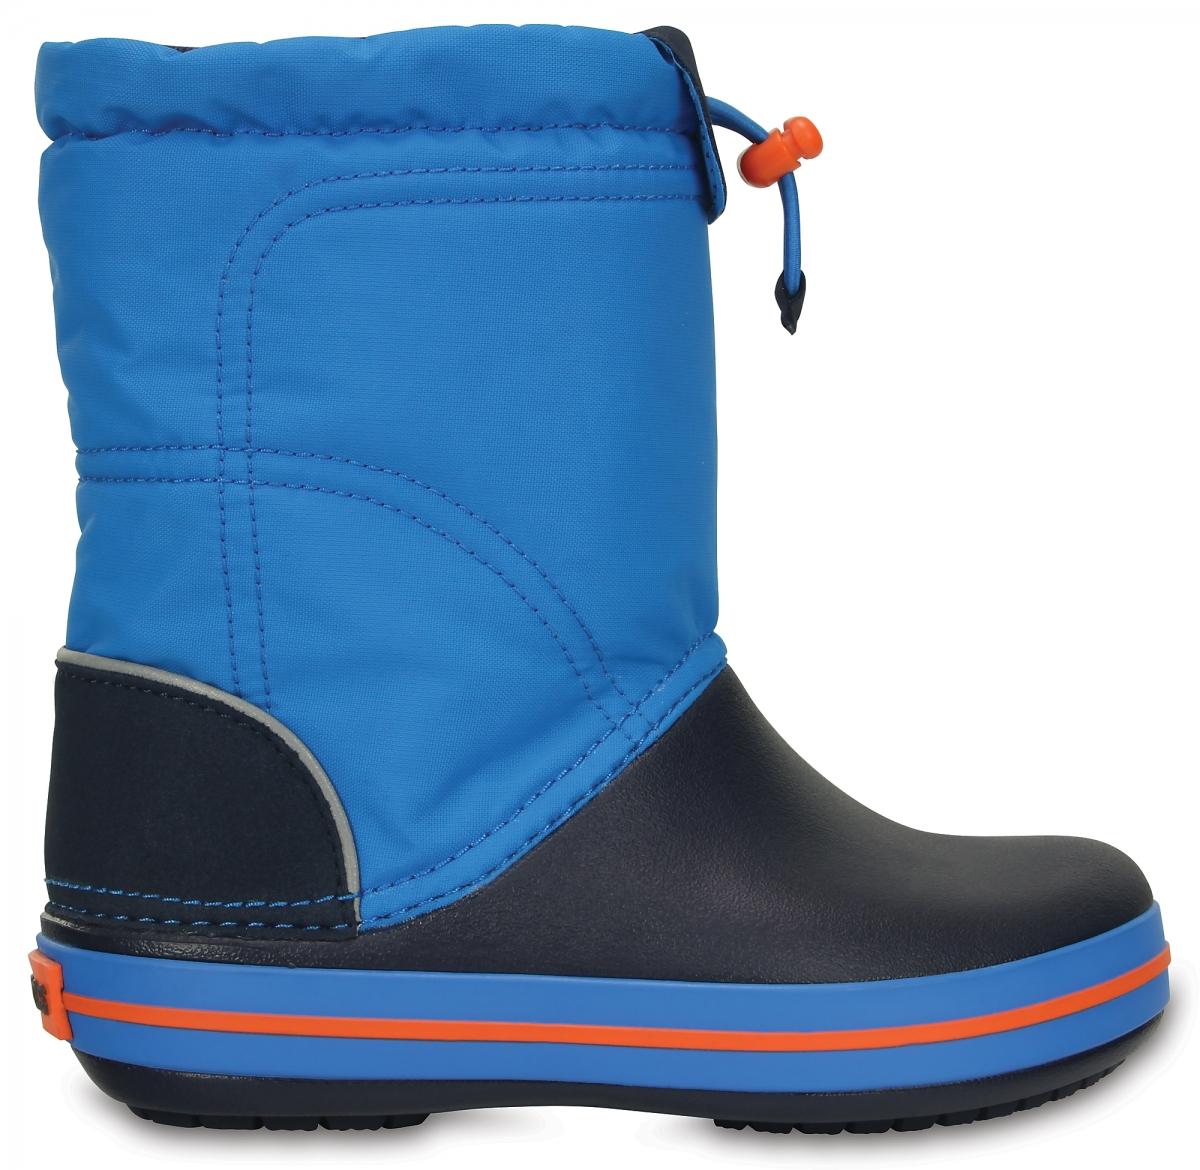 Crocs Crocband LodgePoint Boot Kids Ocean/Navy, J2 (33-34)